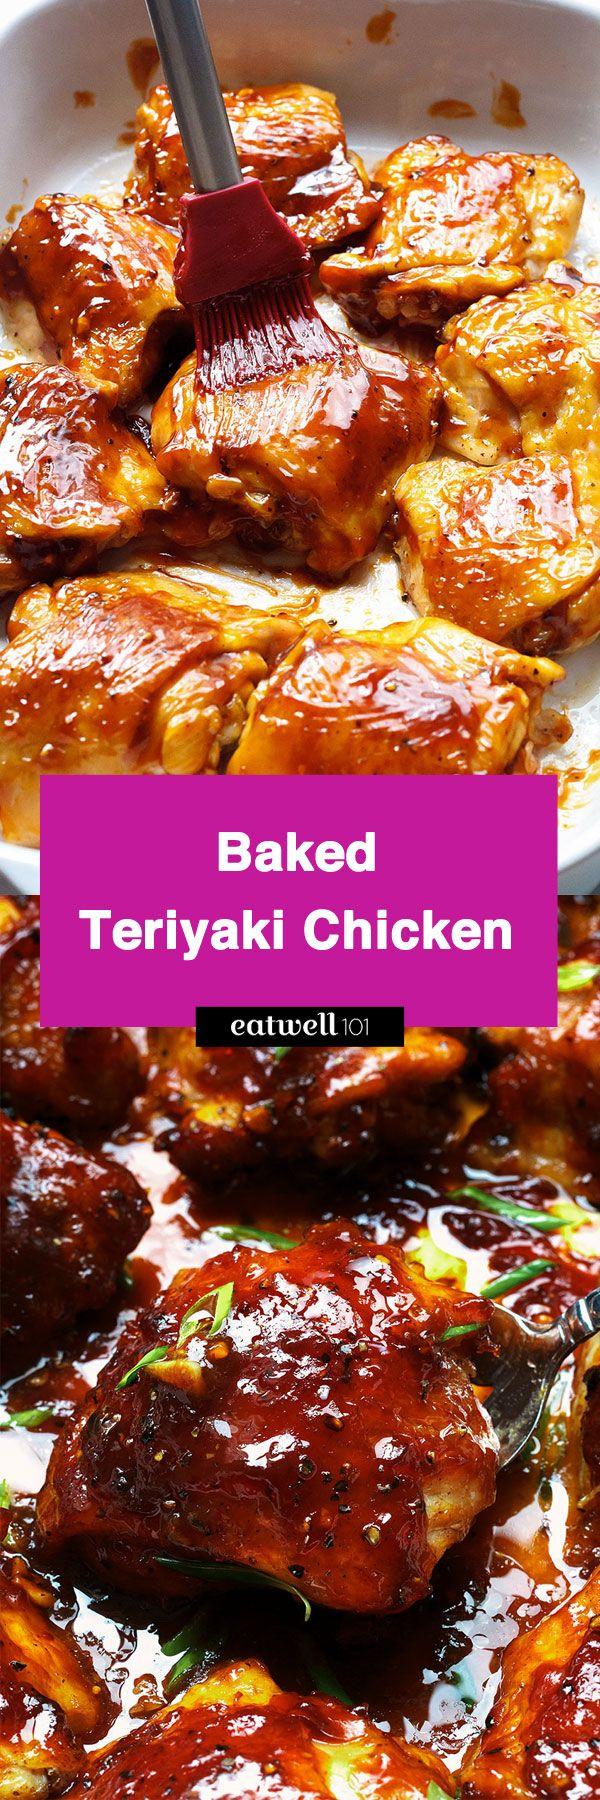 Baked Teriyaki Chicken - An easy chicken dinner baked in the oven with a sticky homemade teriyaki sauce.